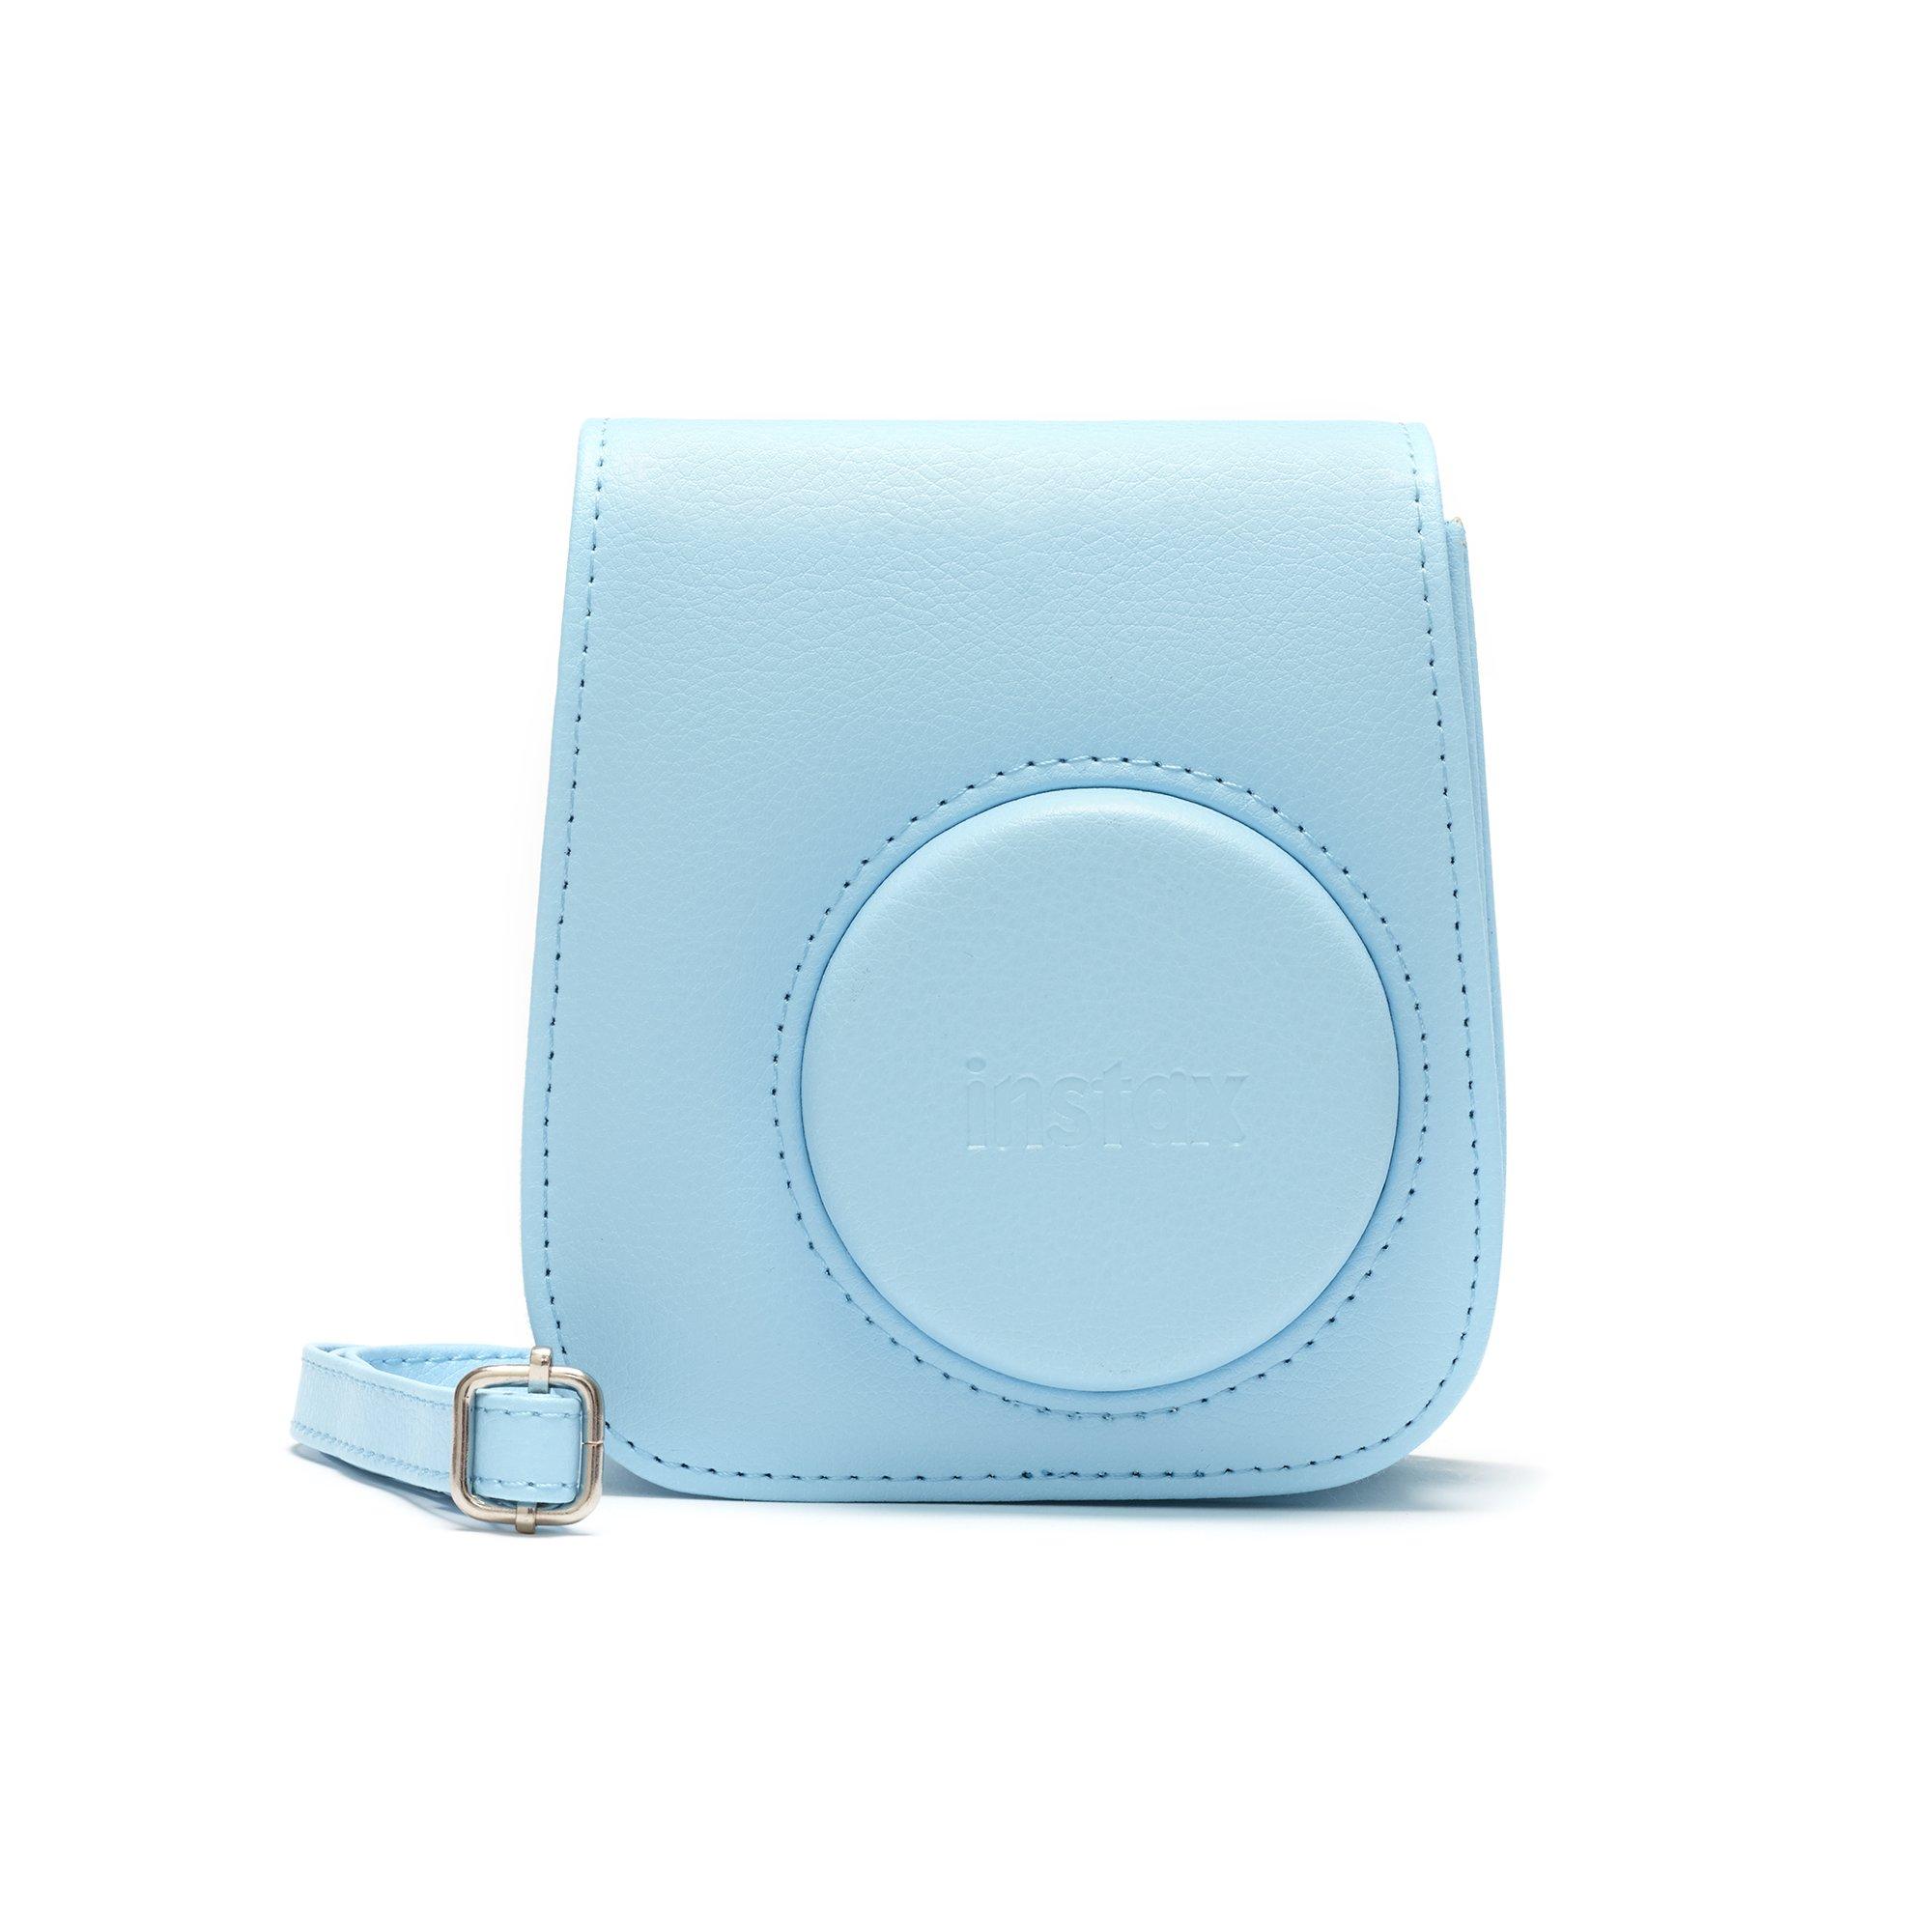 Case instax mini 11 - Sky Blue